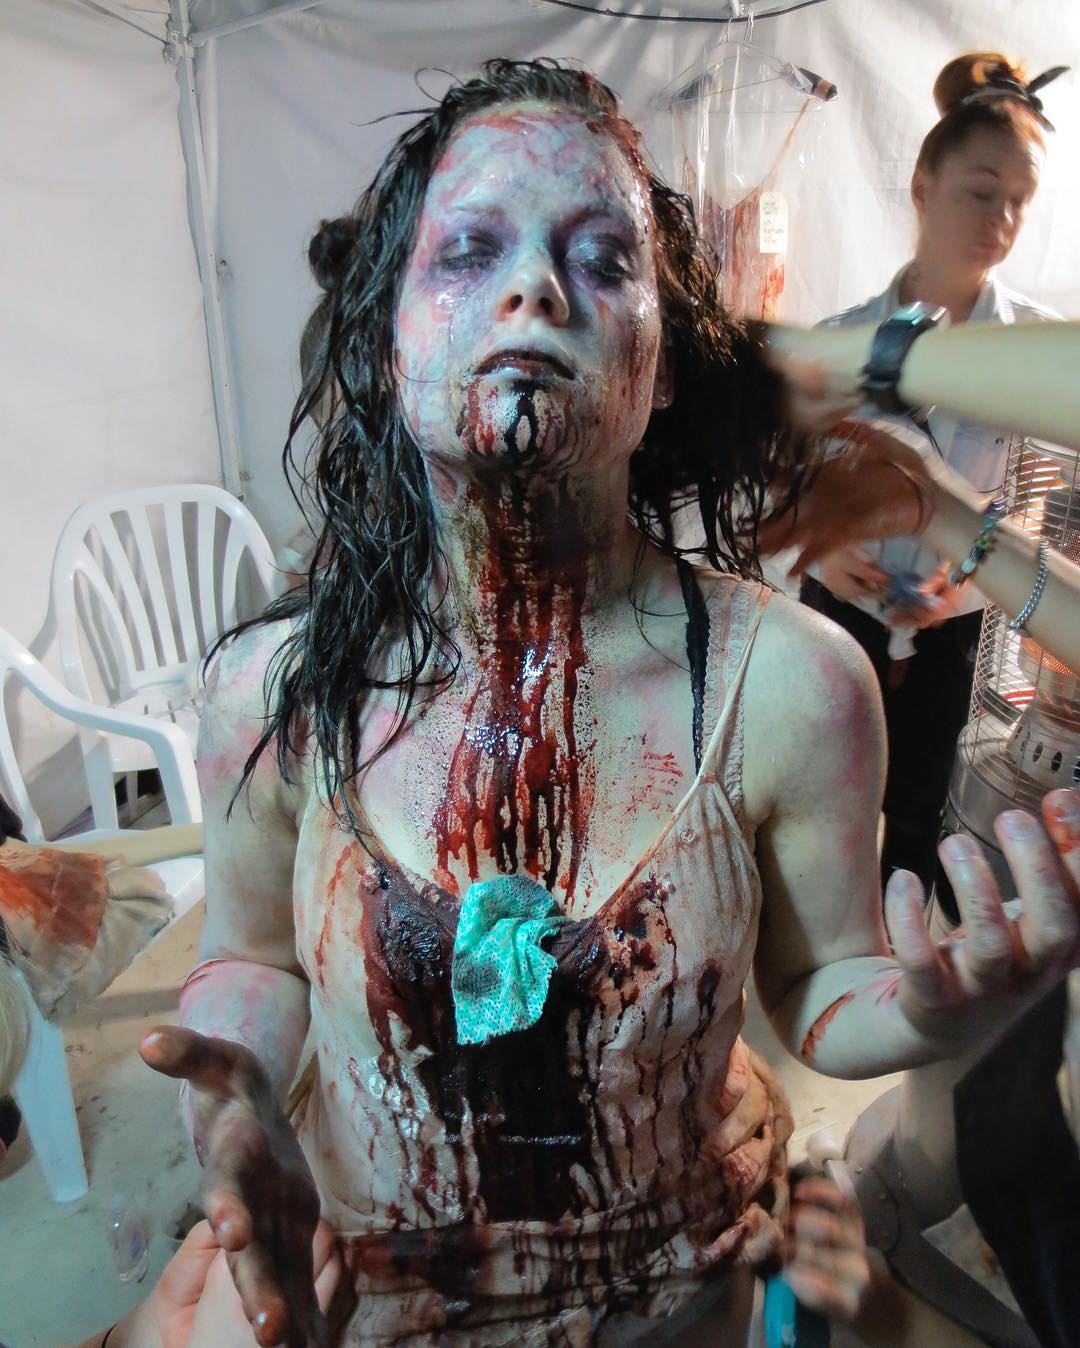 Джейн Леви: In honor of Friday the 13th --